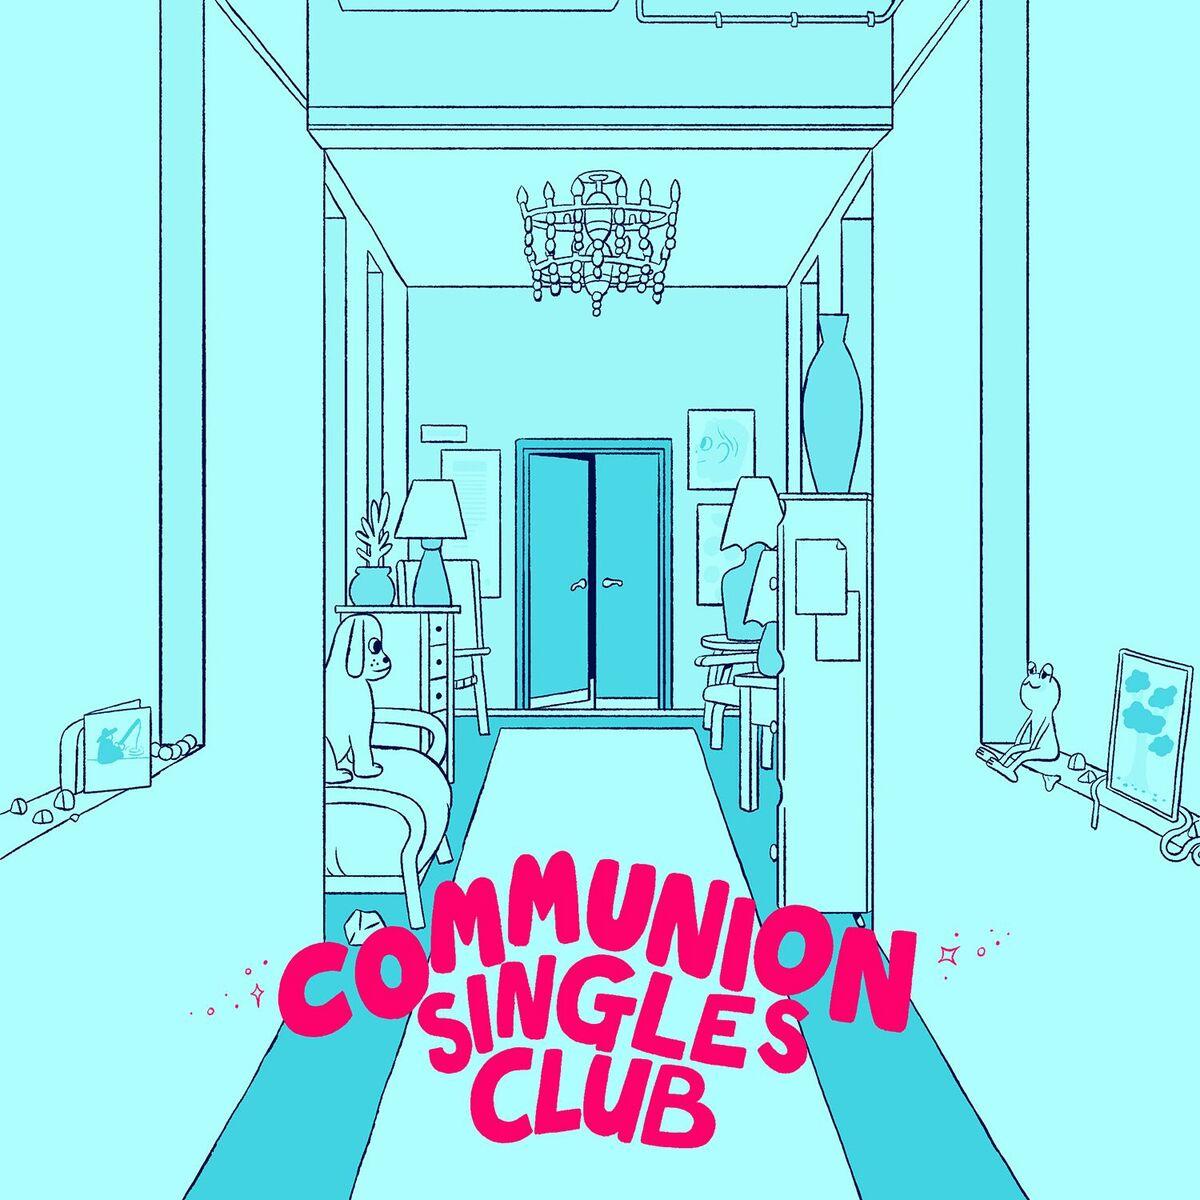 Communion Singles Club 2017 Subscription - Communion